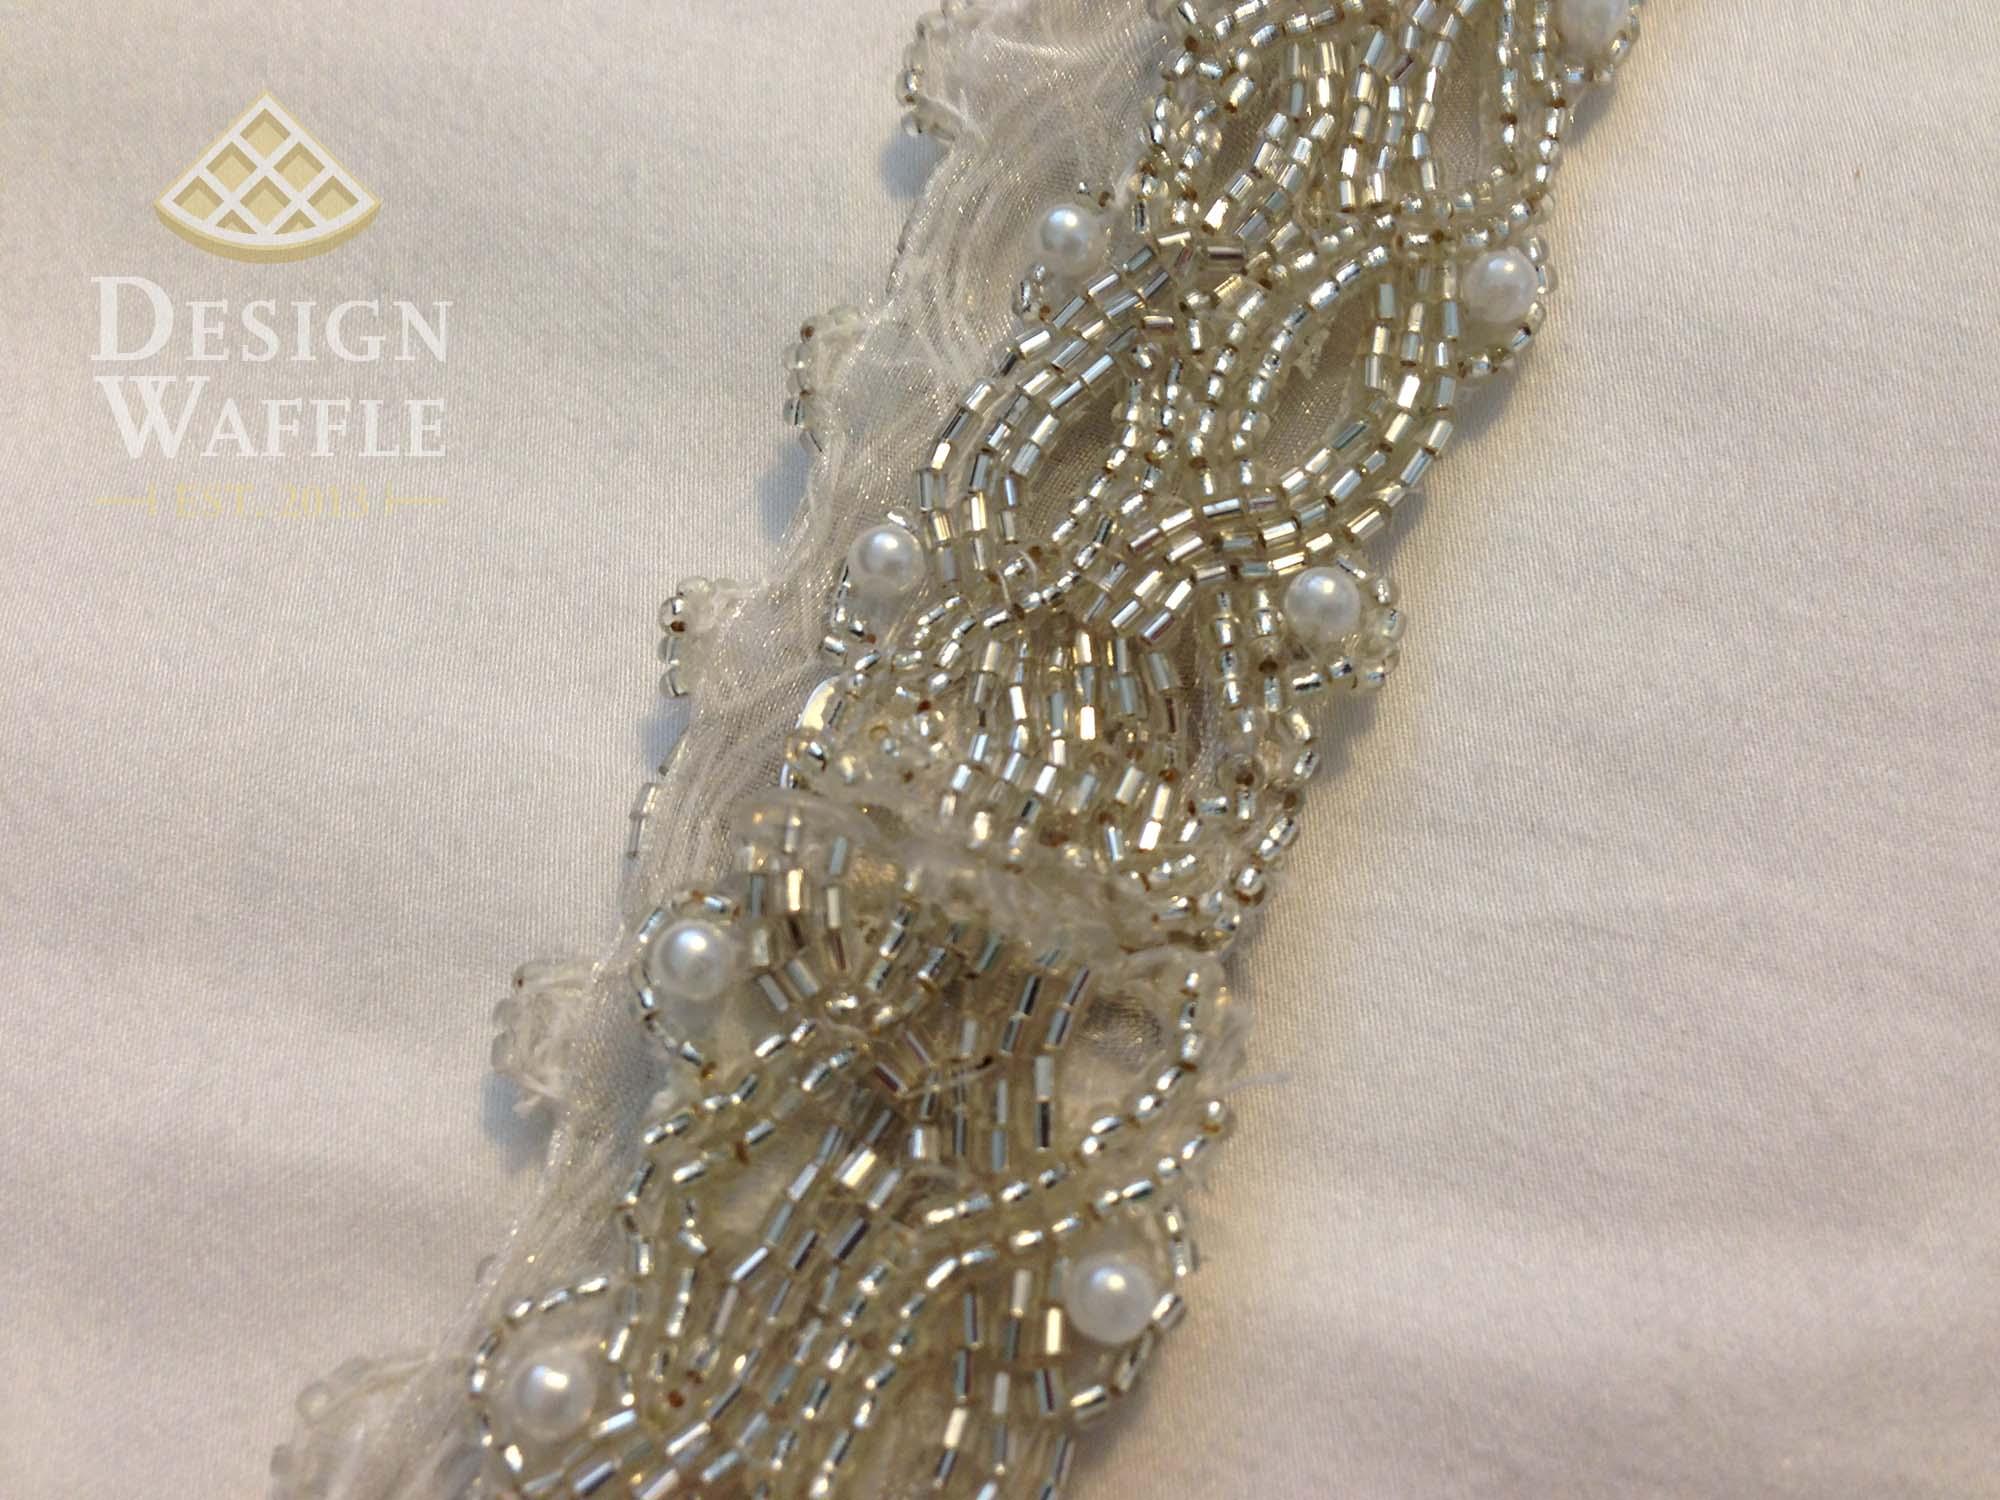 Diy beaded wedding belt design waffle diy beaded wedding belt tutorial solutioingenieria Images